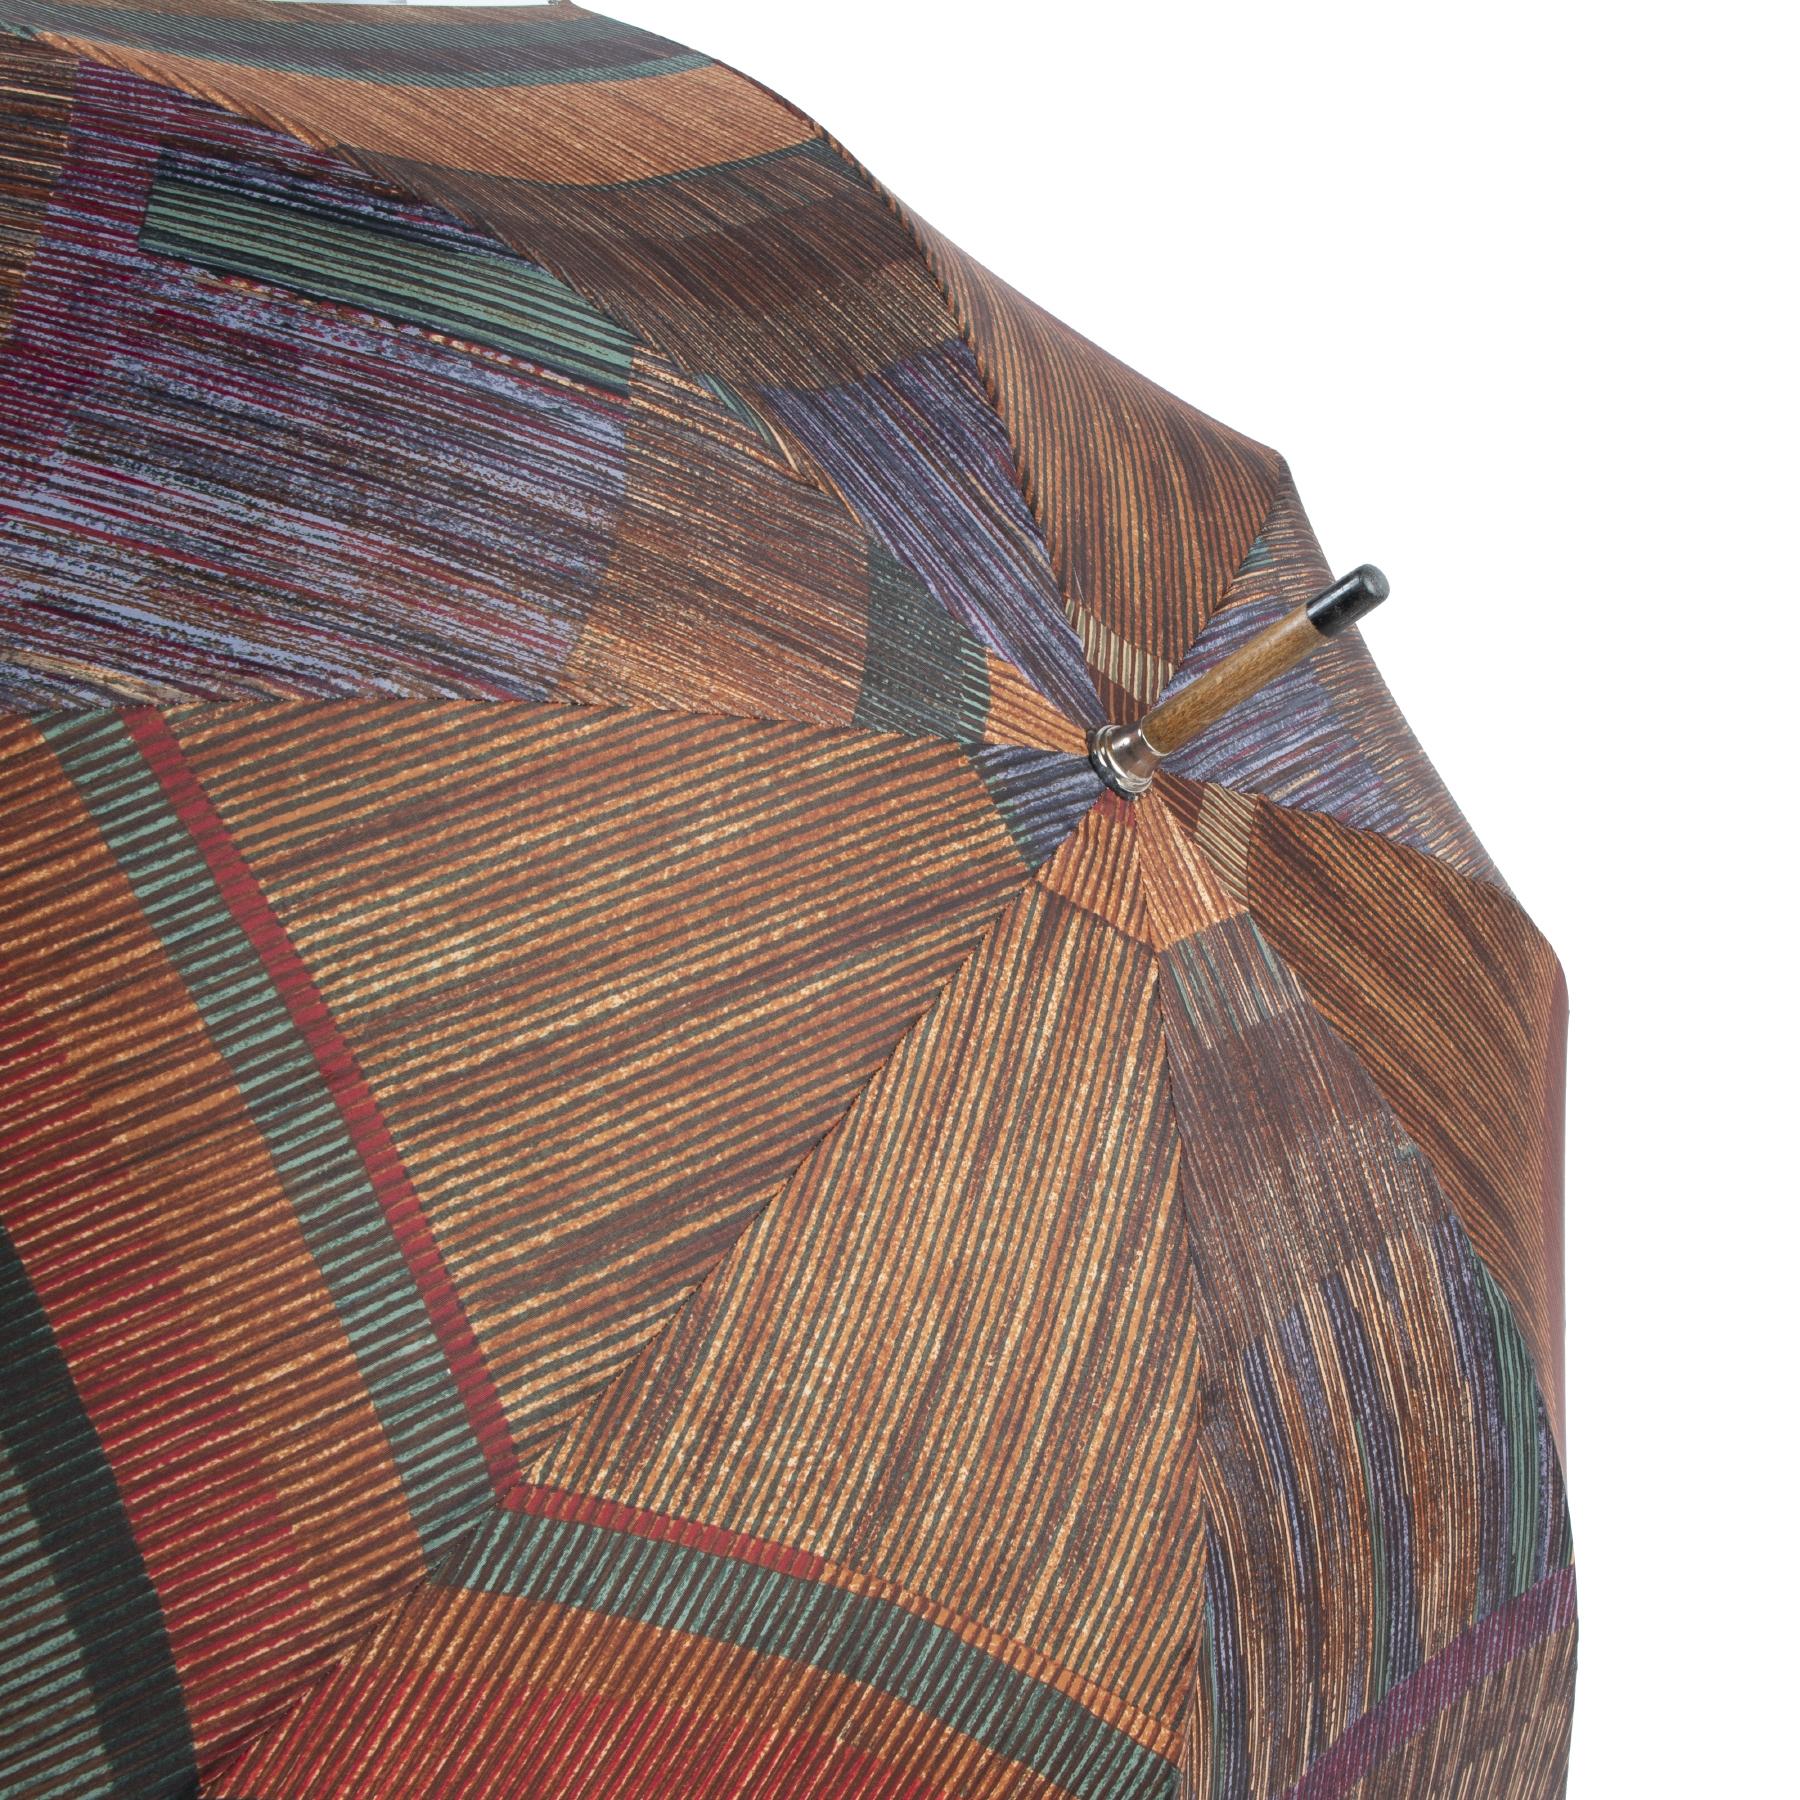 Mizuno Ami Car Reverse Umbrella With C-Shaped Handle UV Protection Inverted Folding Umbrellas Windproof And Rainproof Double Folding Inverted Umbrella